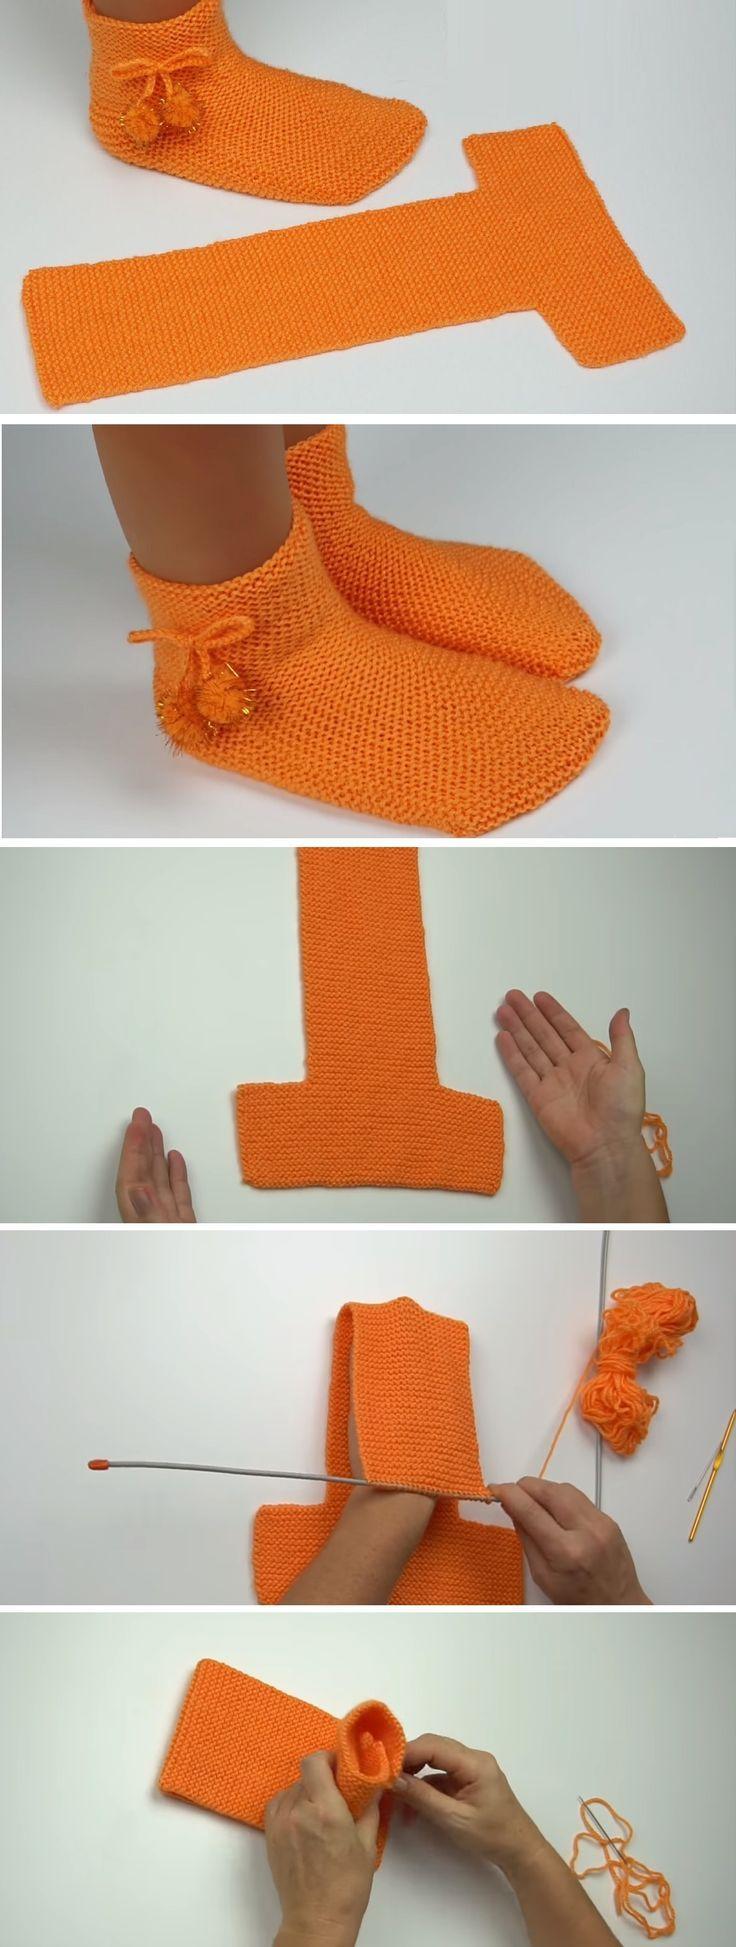 Easy to Fold Slippers – Tutorial Crochet/Knit